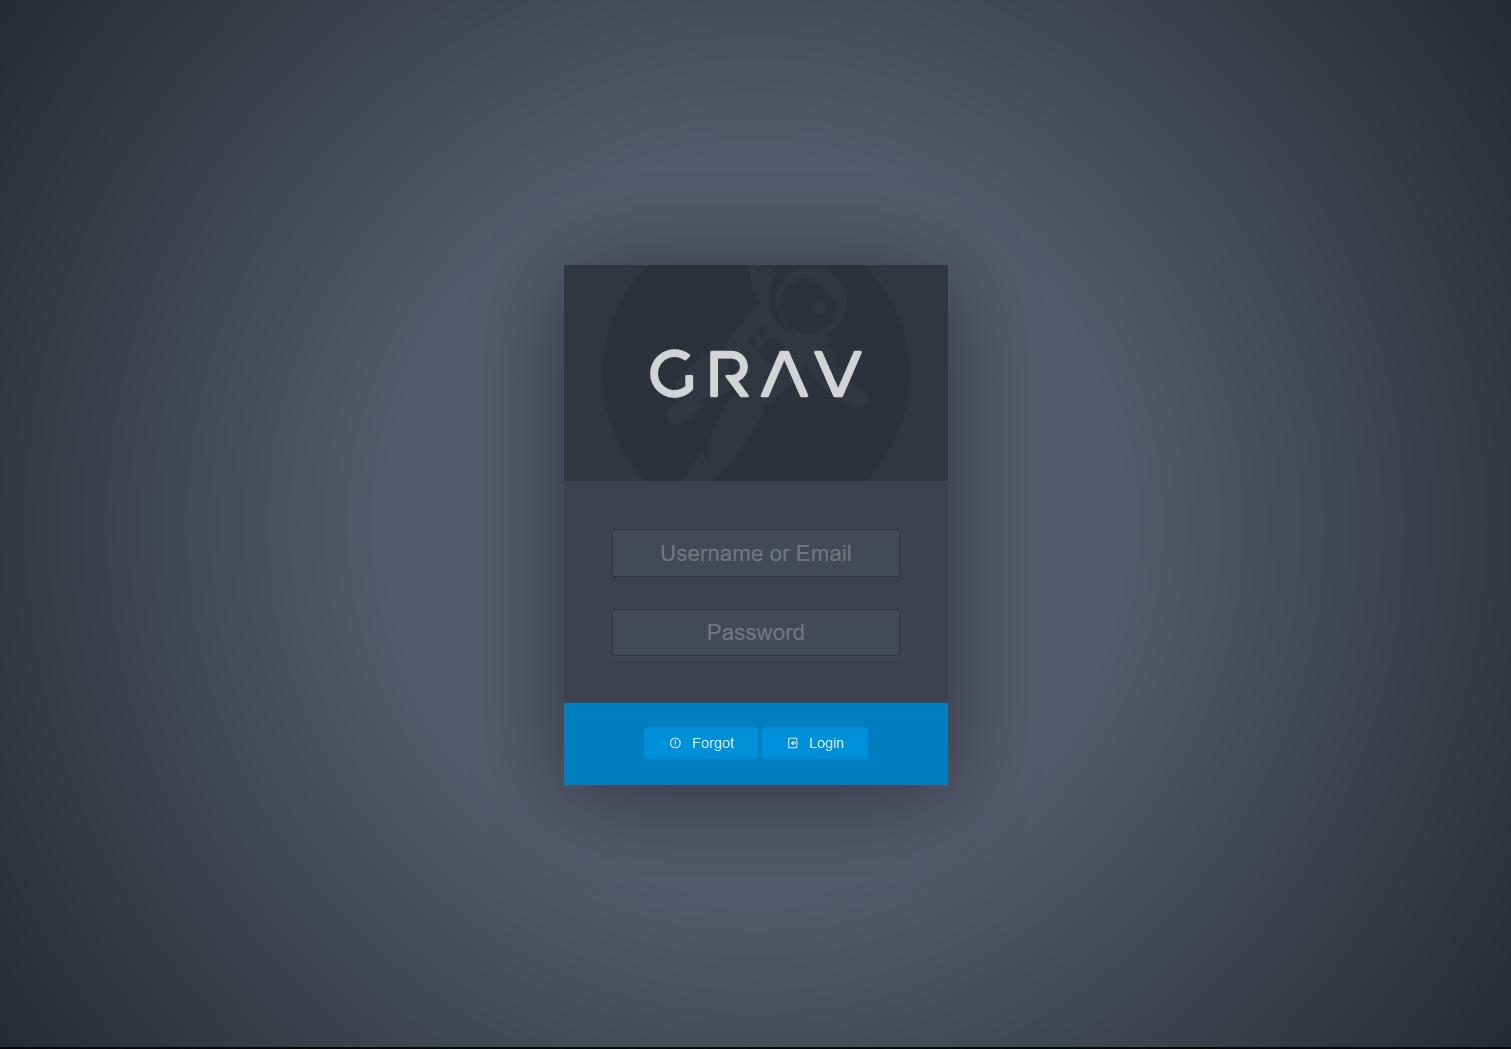 Grav login page